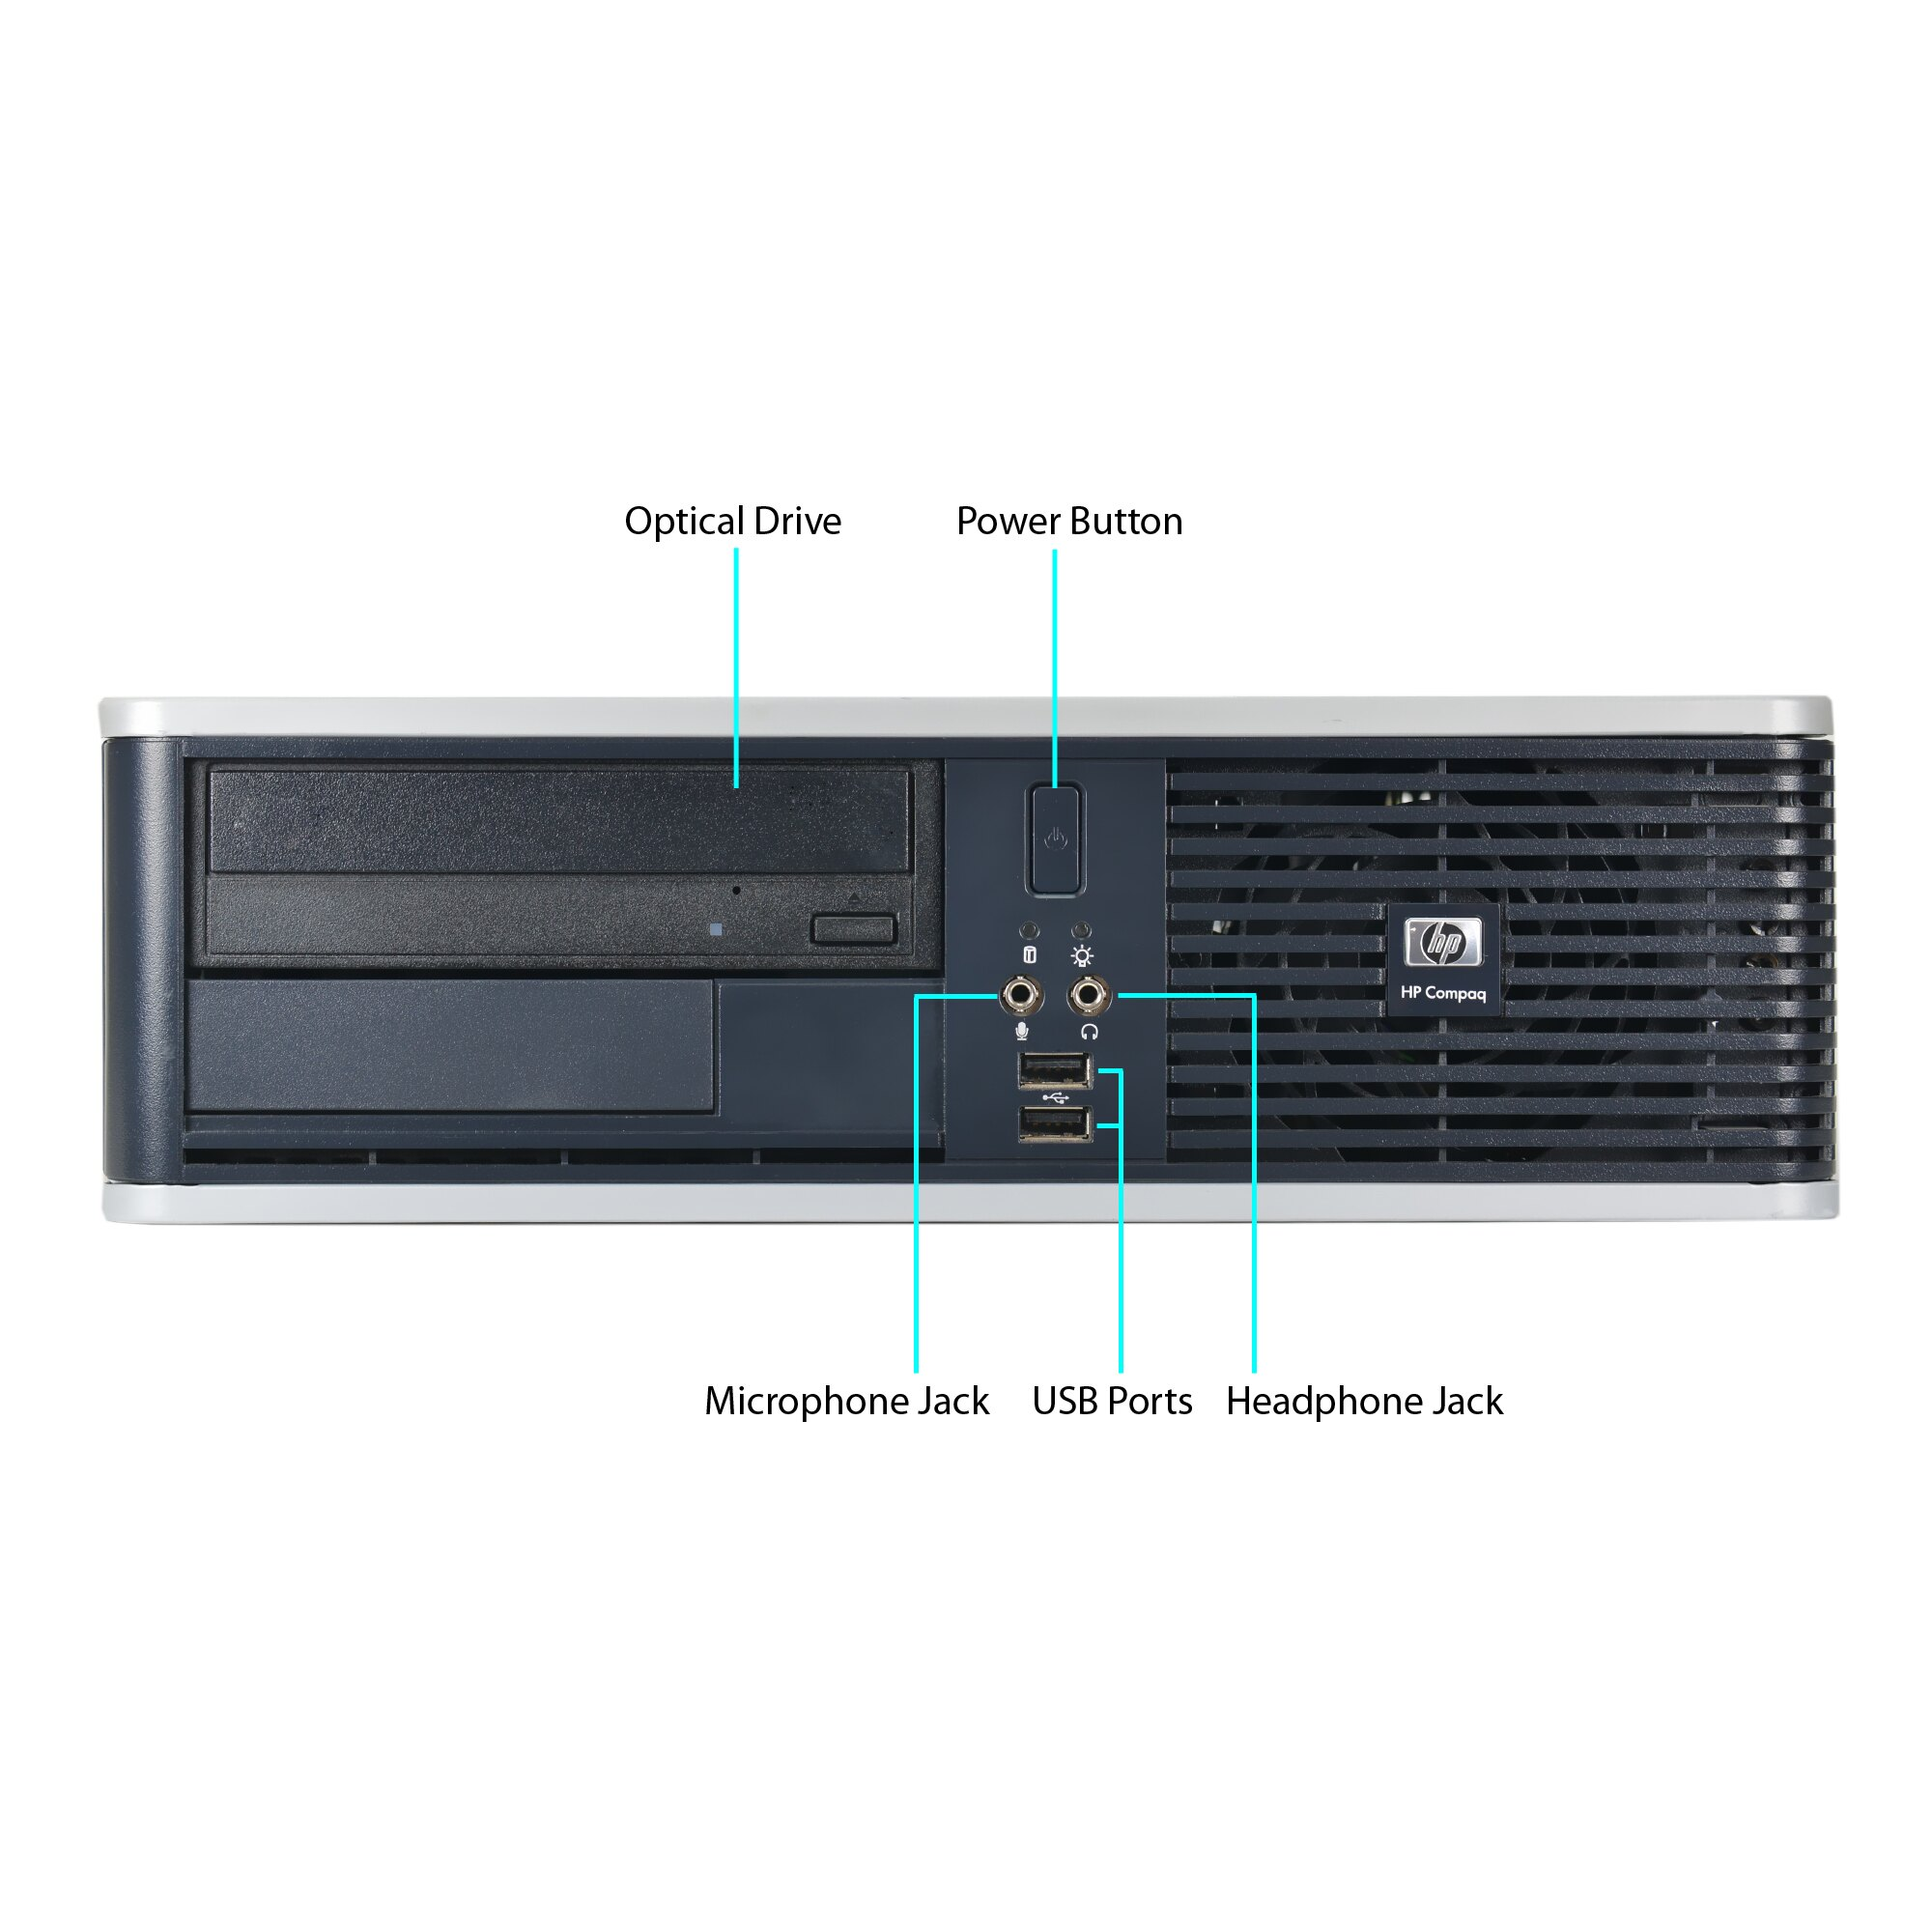 Joy Systems Hp Compaq Dc Small Form Factor Intel C2d 3 0ghz 4gb Ram 160gb Hdd Dvd Win